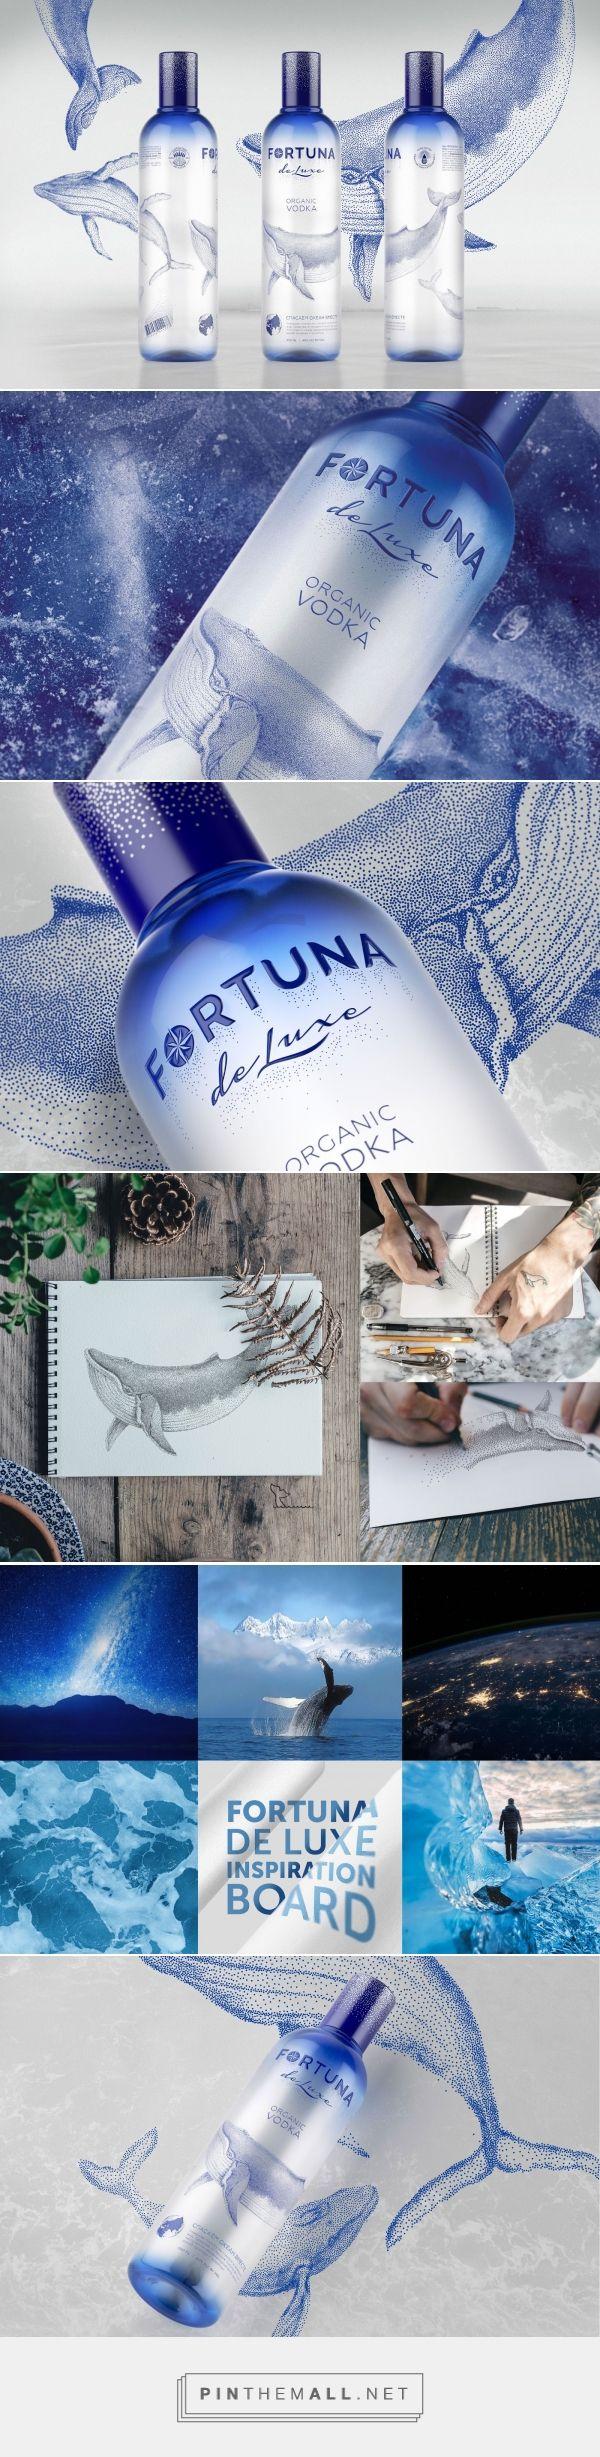 Fortuna de Luxe - Organic #Vodka #packaging #design by DDC.Lab - http://www.packagingoftheworld.com/2017/12/fortuna-de-luxe-organic-vodka.html